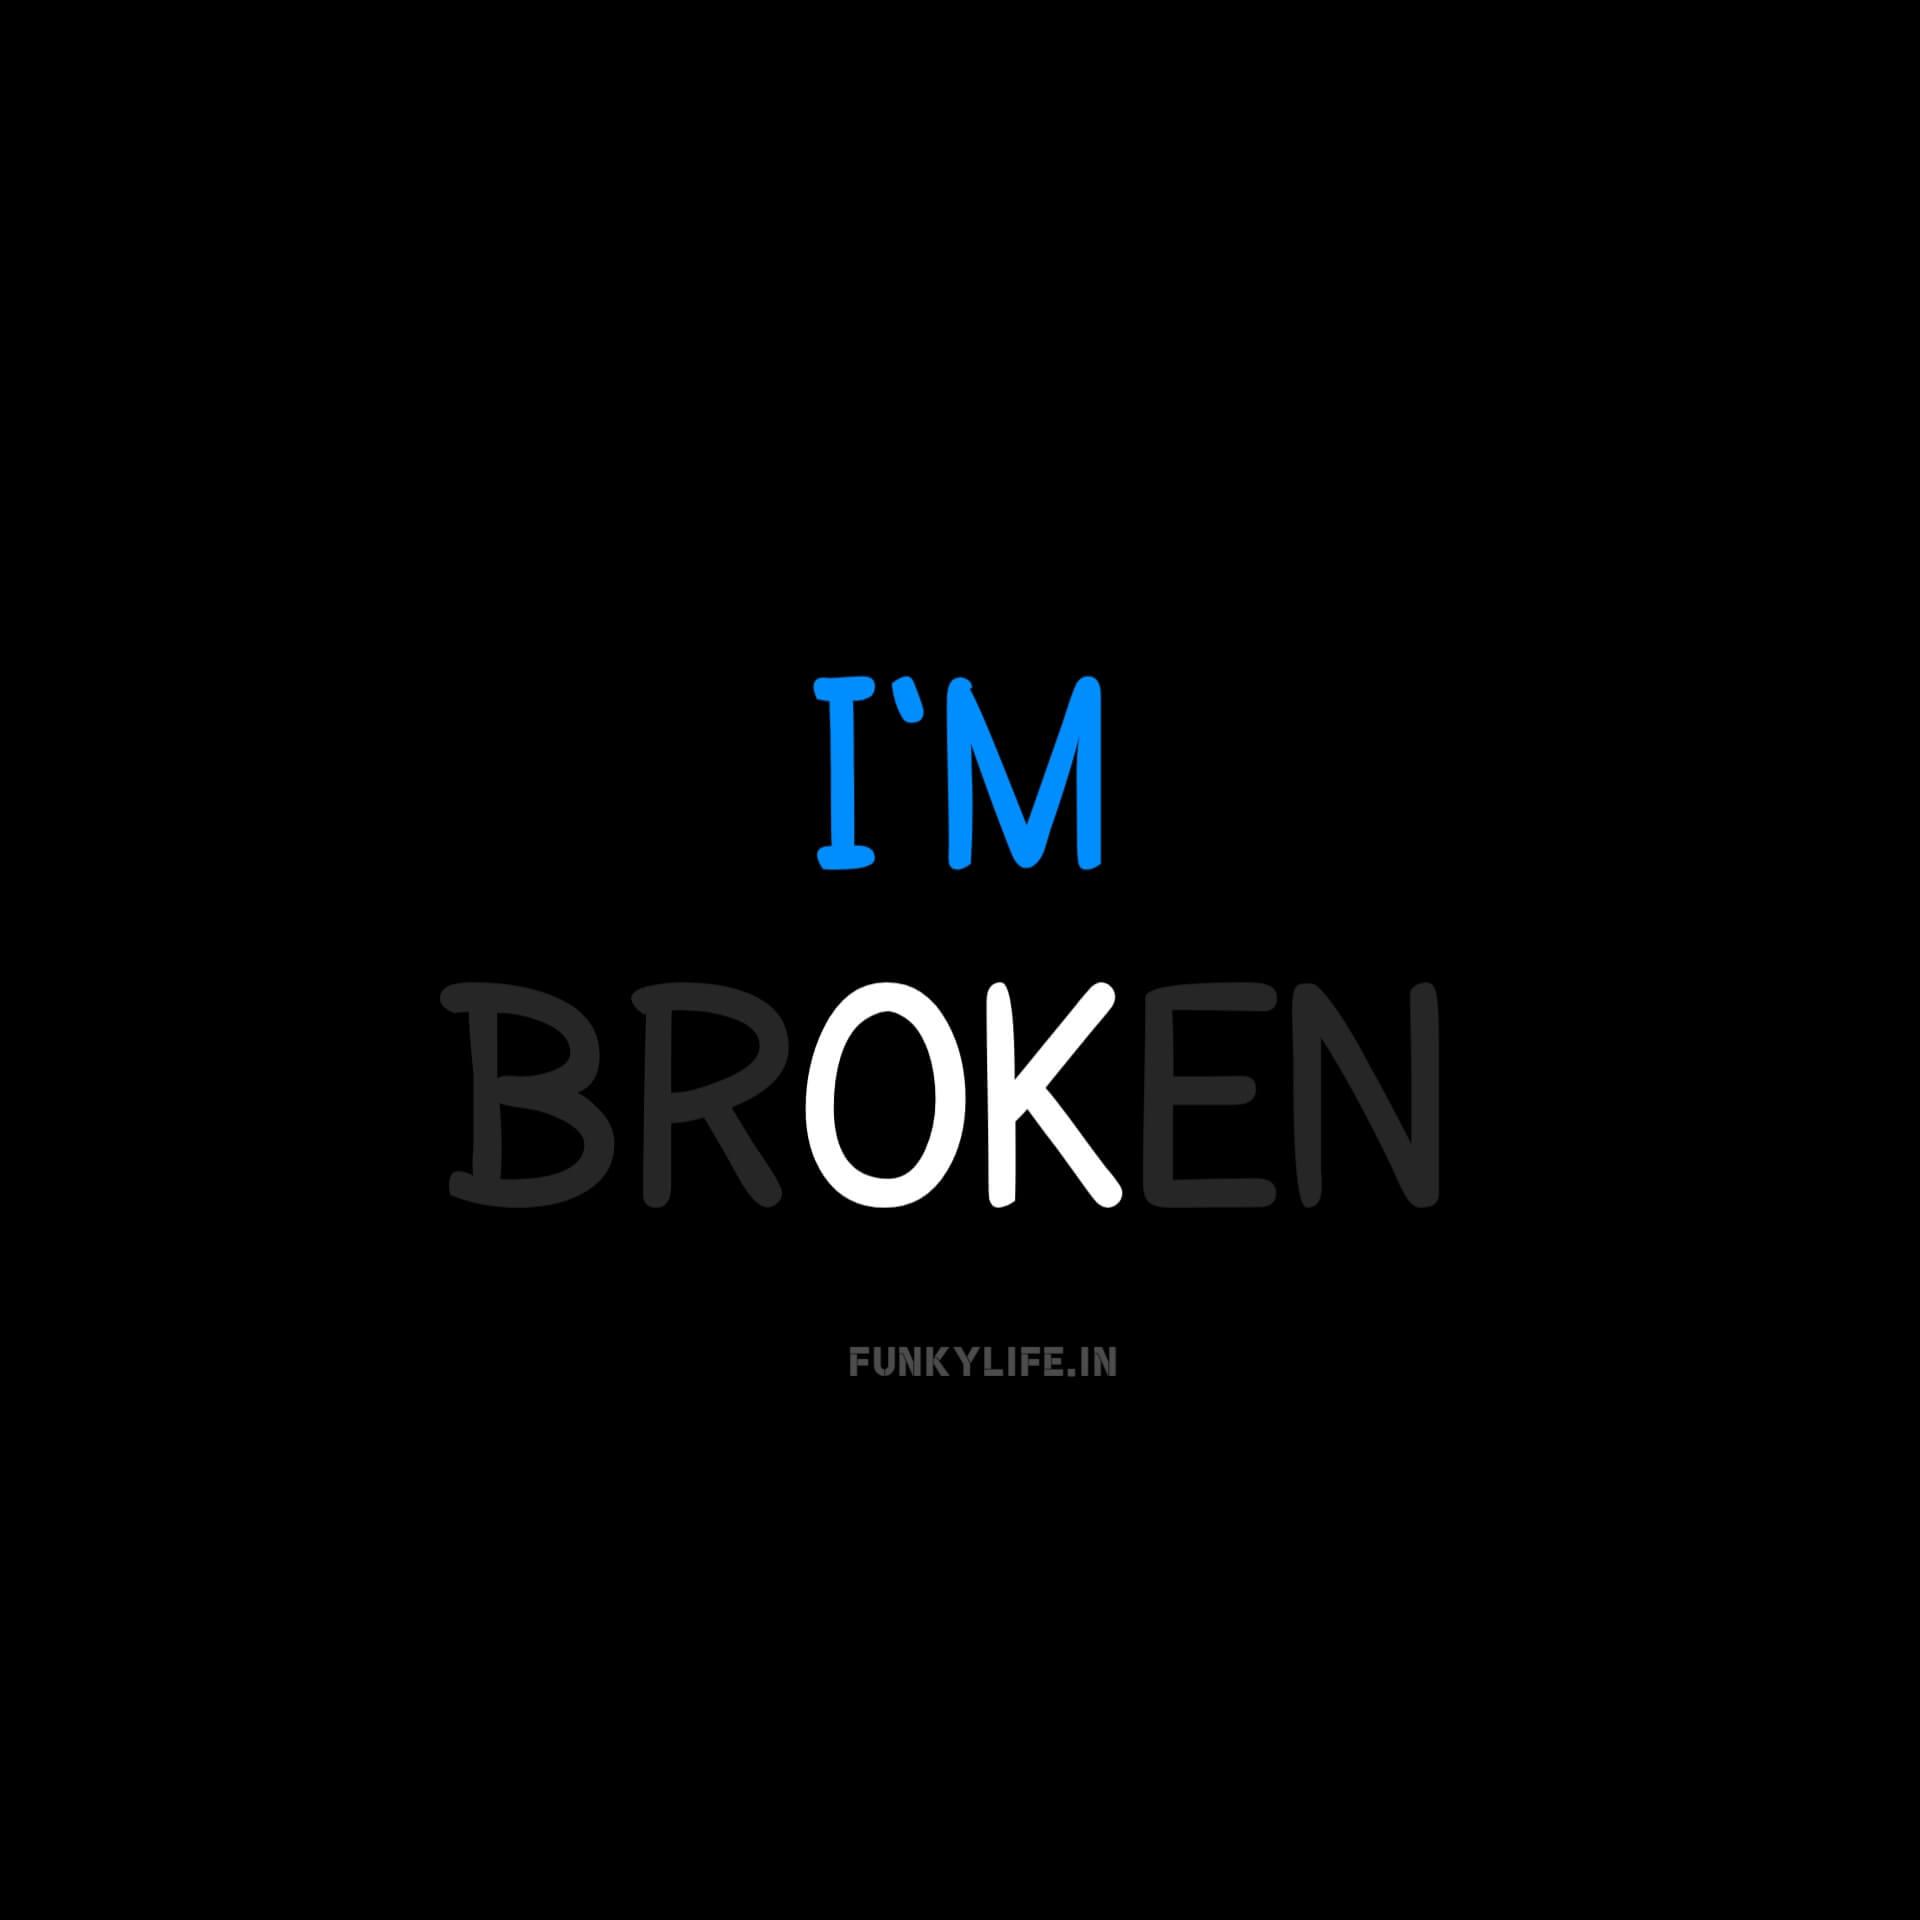 I'm Broken WhatsApp Profile DP